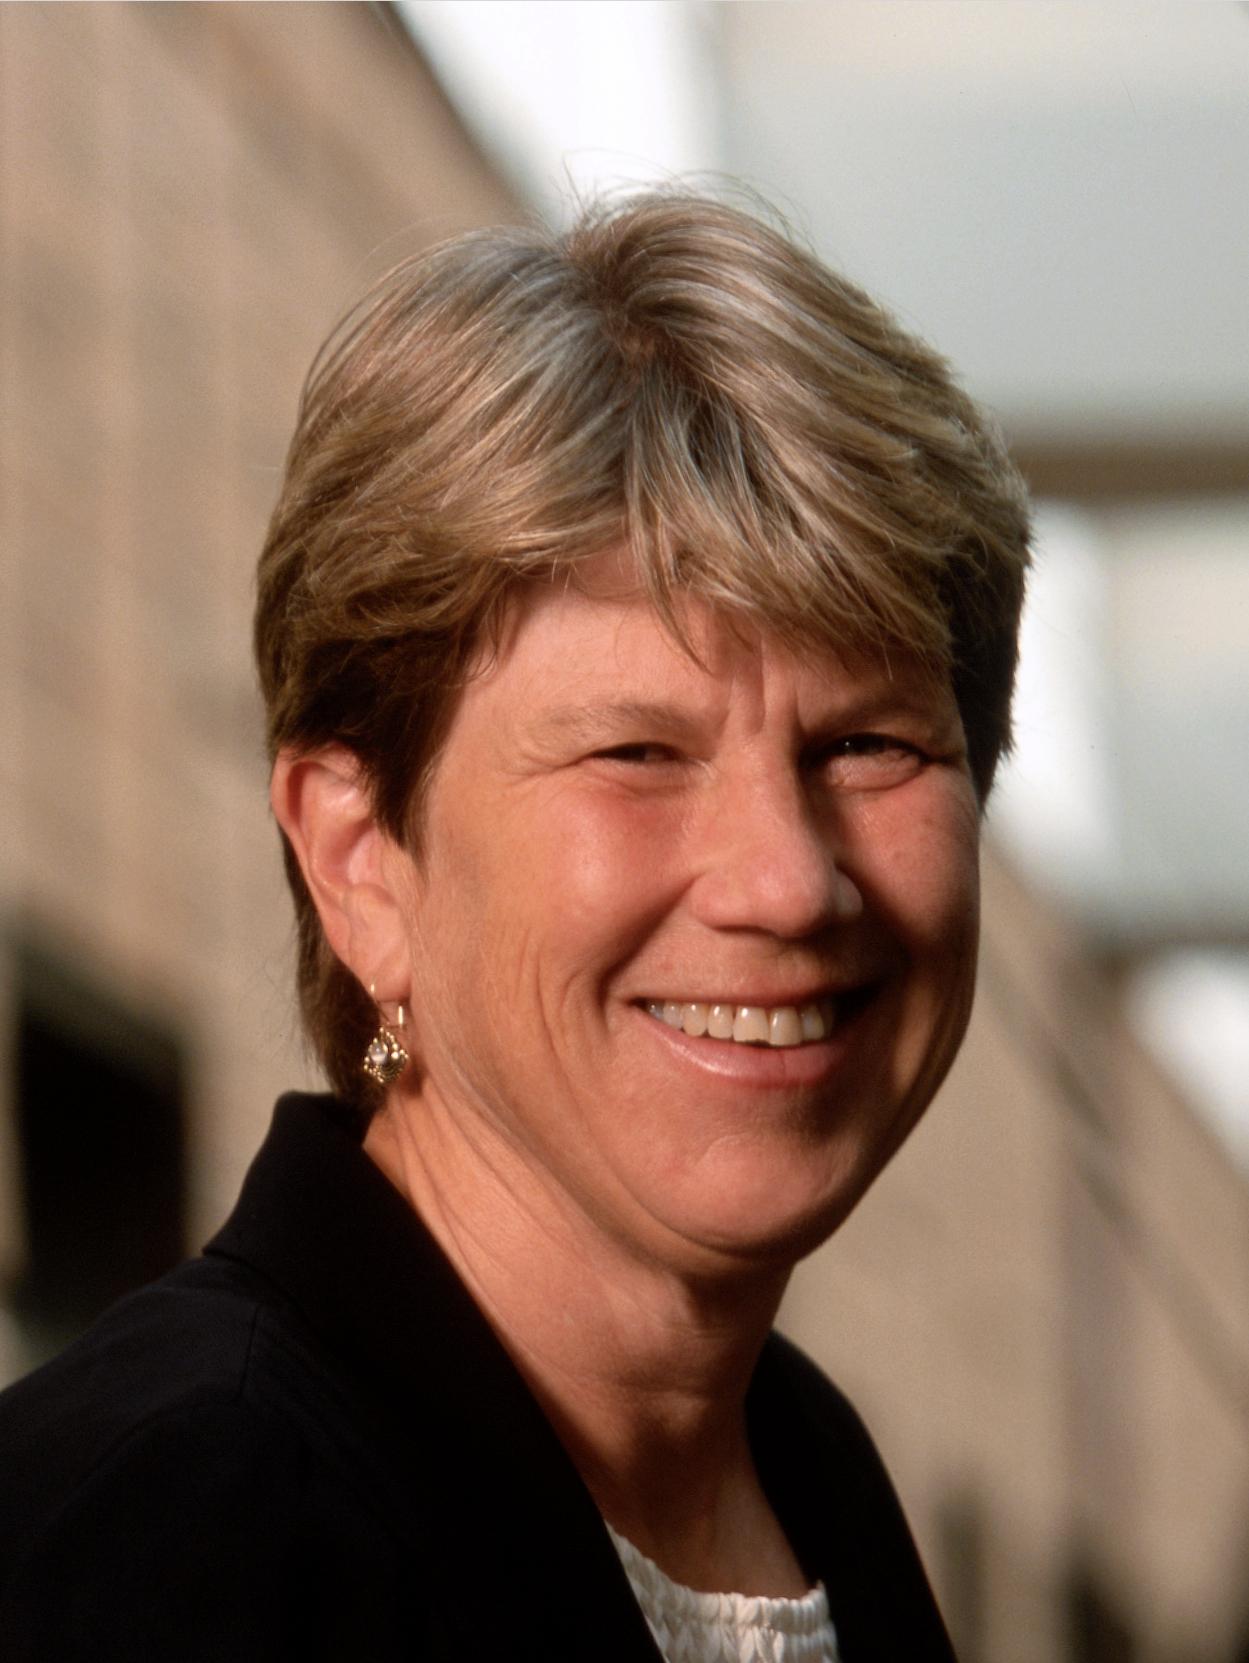 Ann Markusen